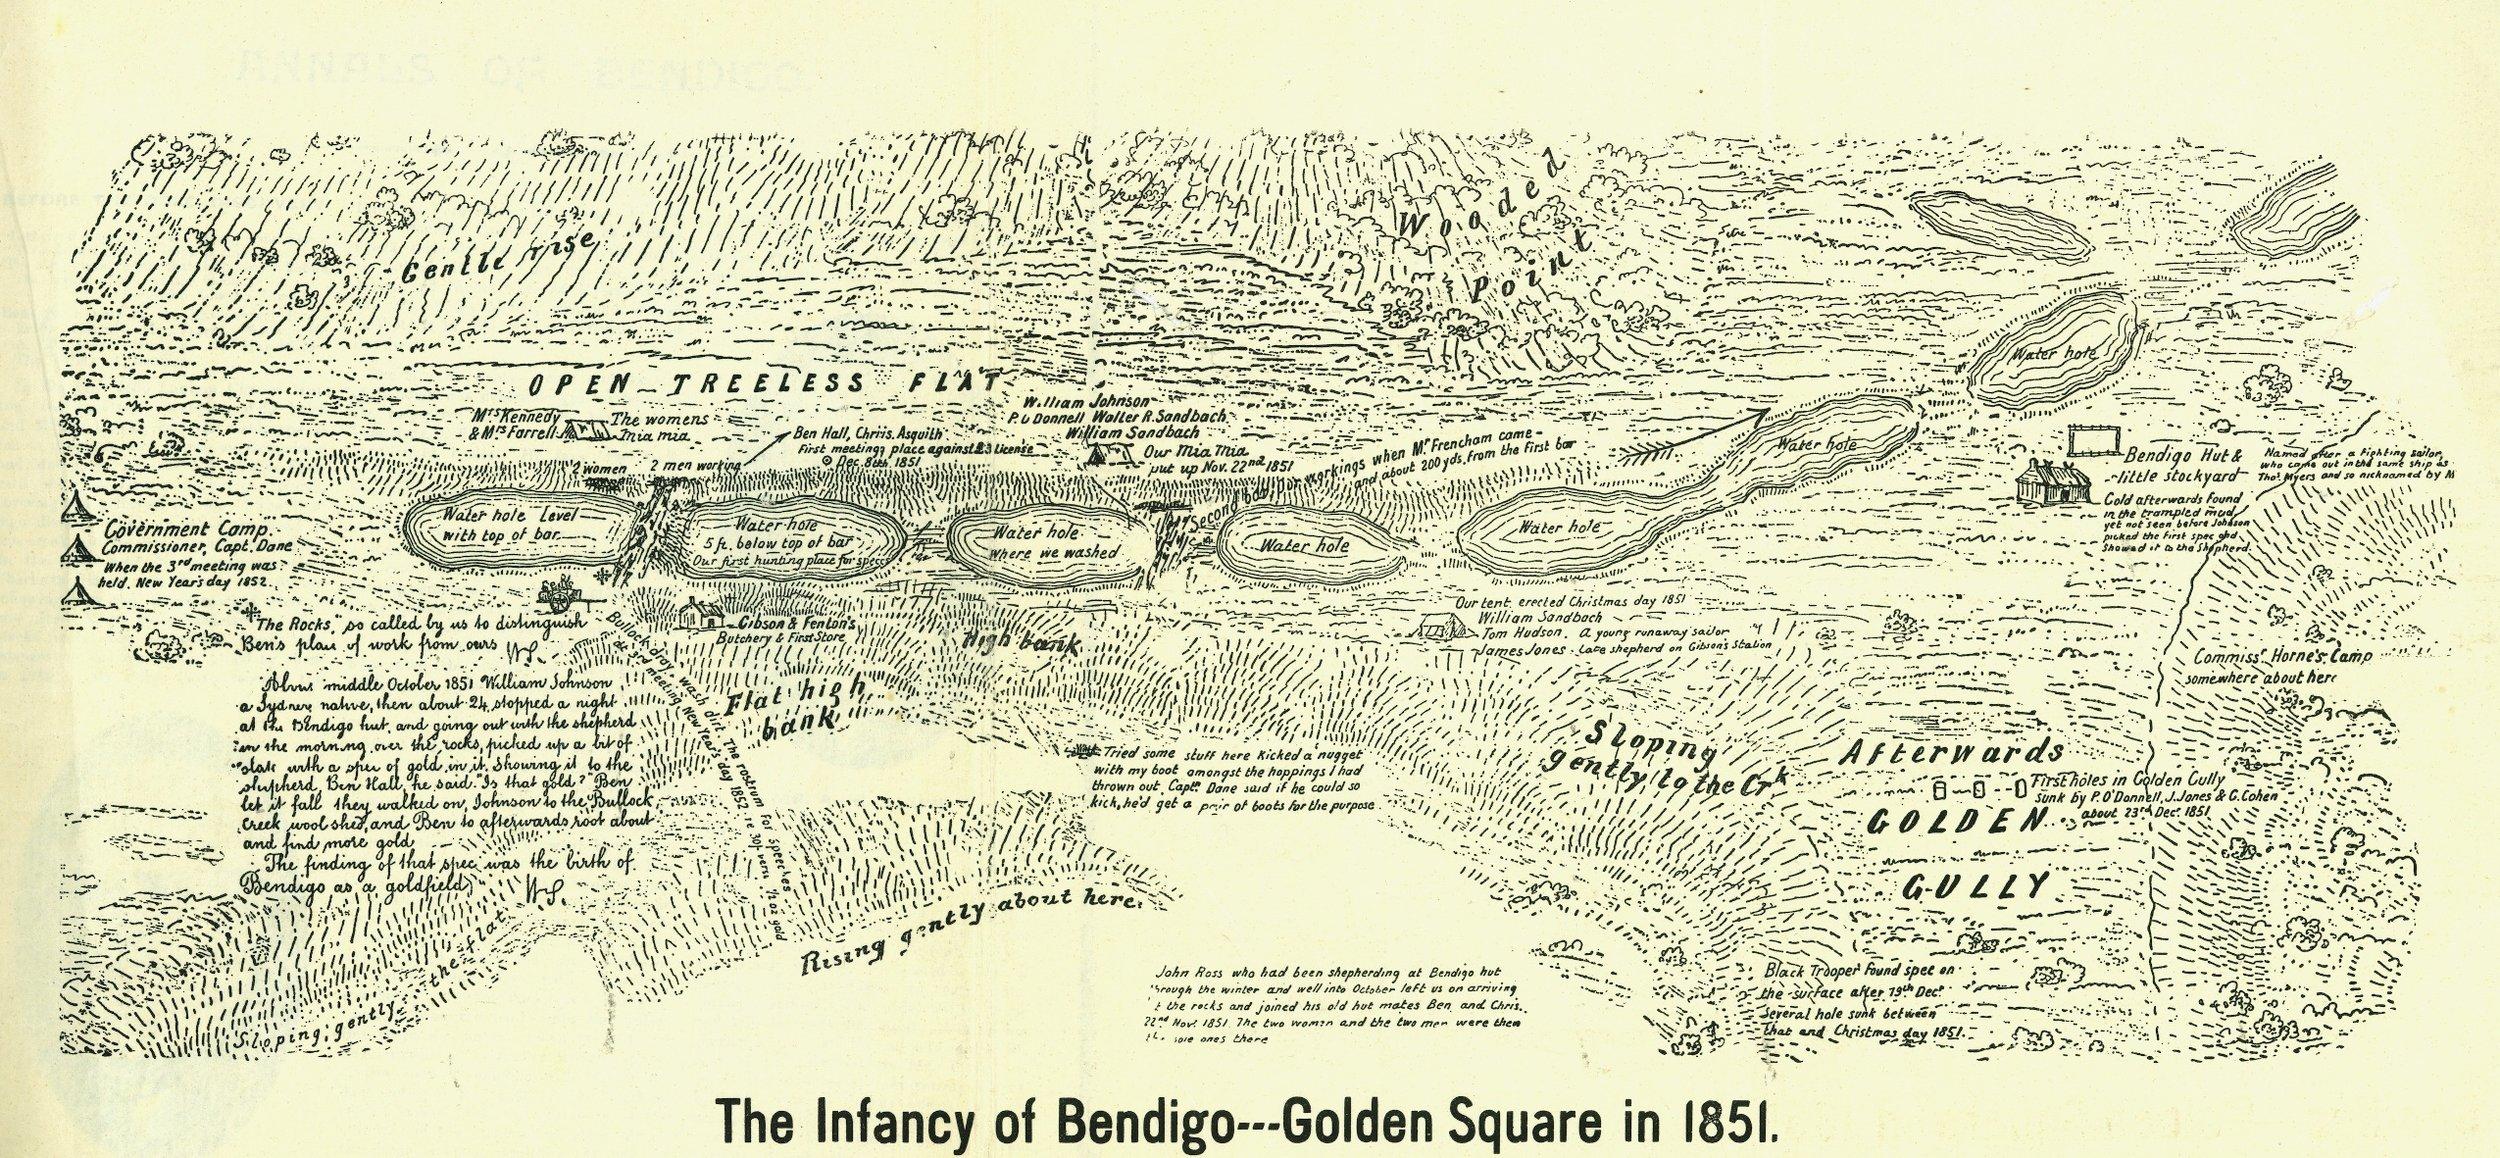 10 The Infancy of Bendigo 1851 Map_resized.jpg